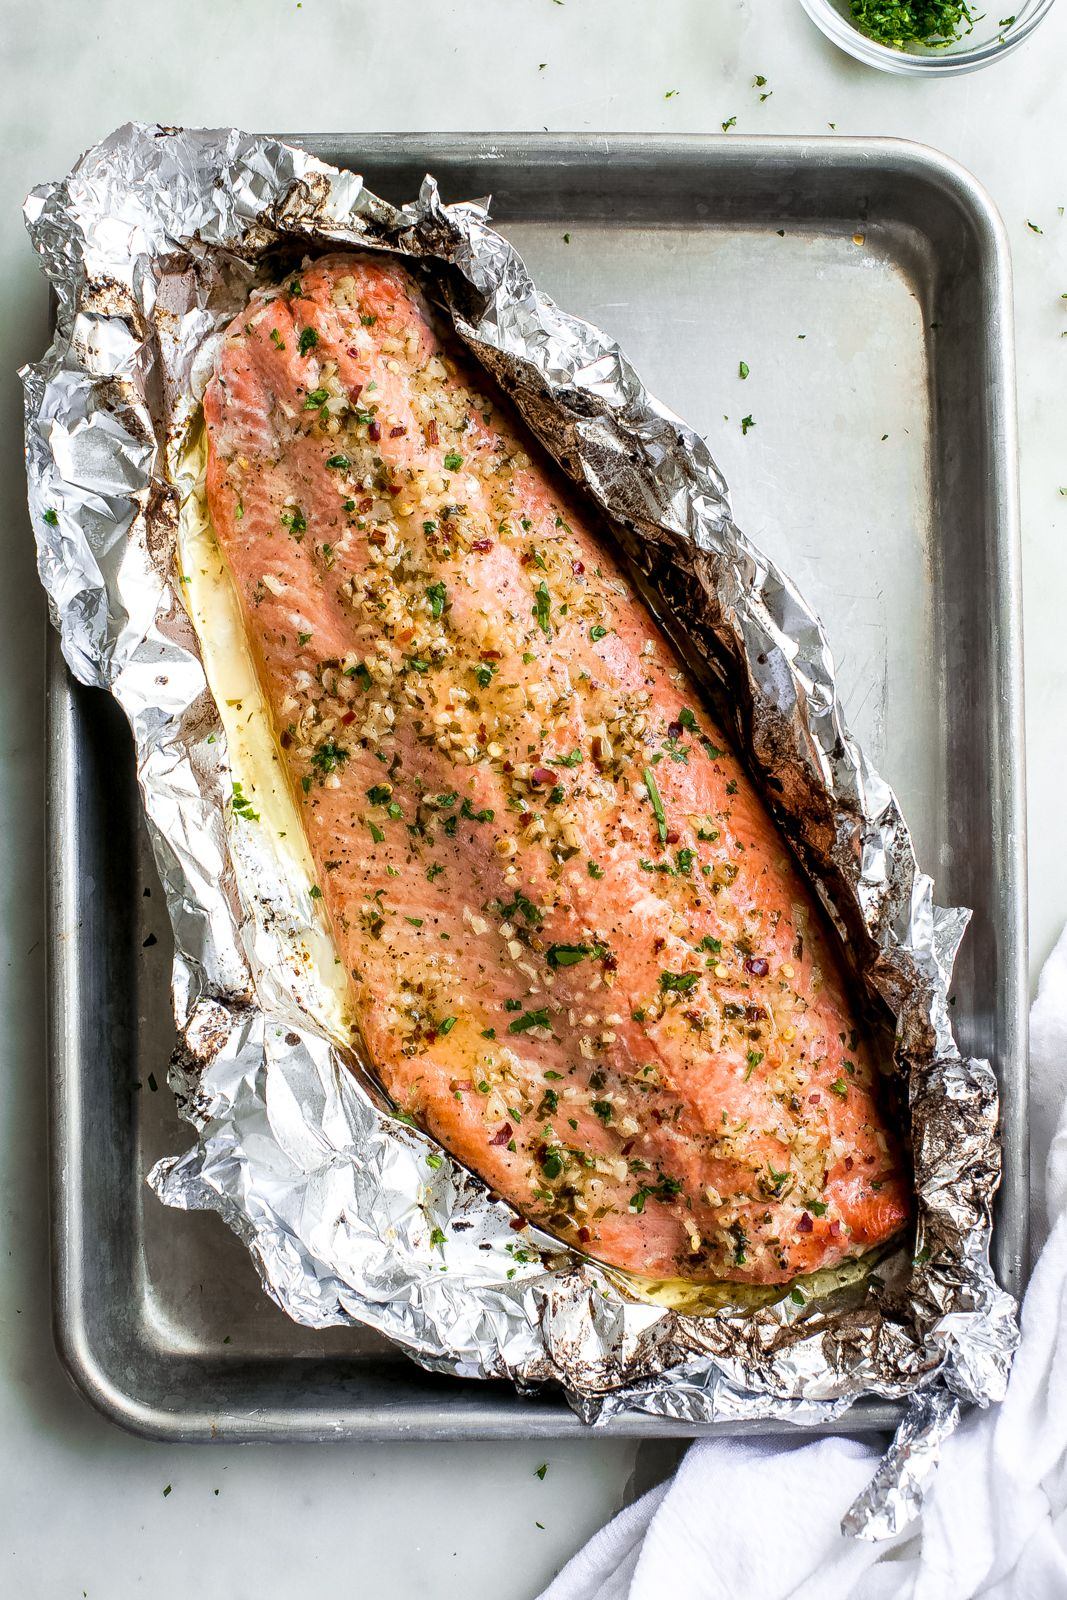 Garlic Butter Baked Salmon In Foil Recipe Little Spice Jar Recipe Baked Salmon Baked Salmon Recipes Salmon In Foil Recipes